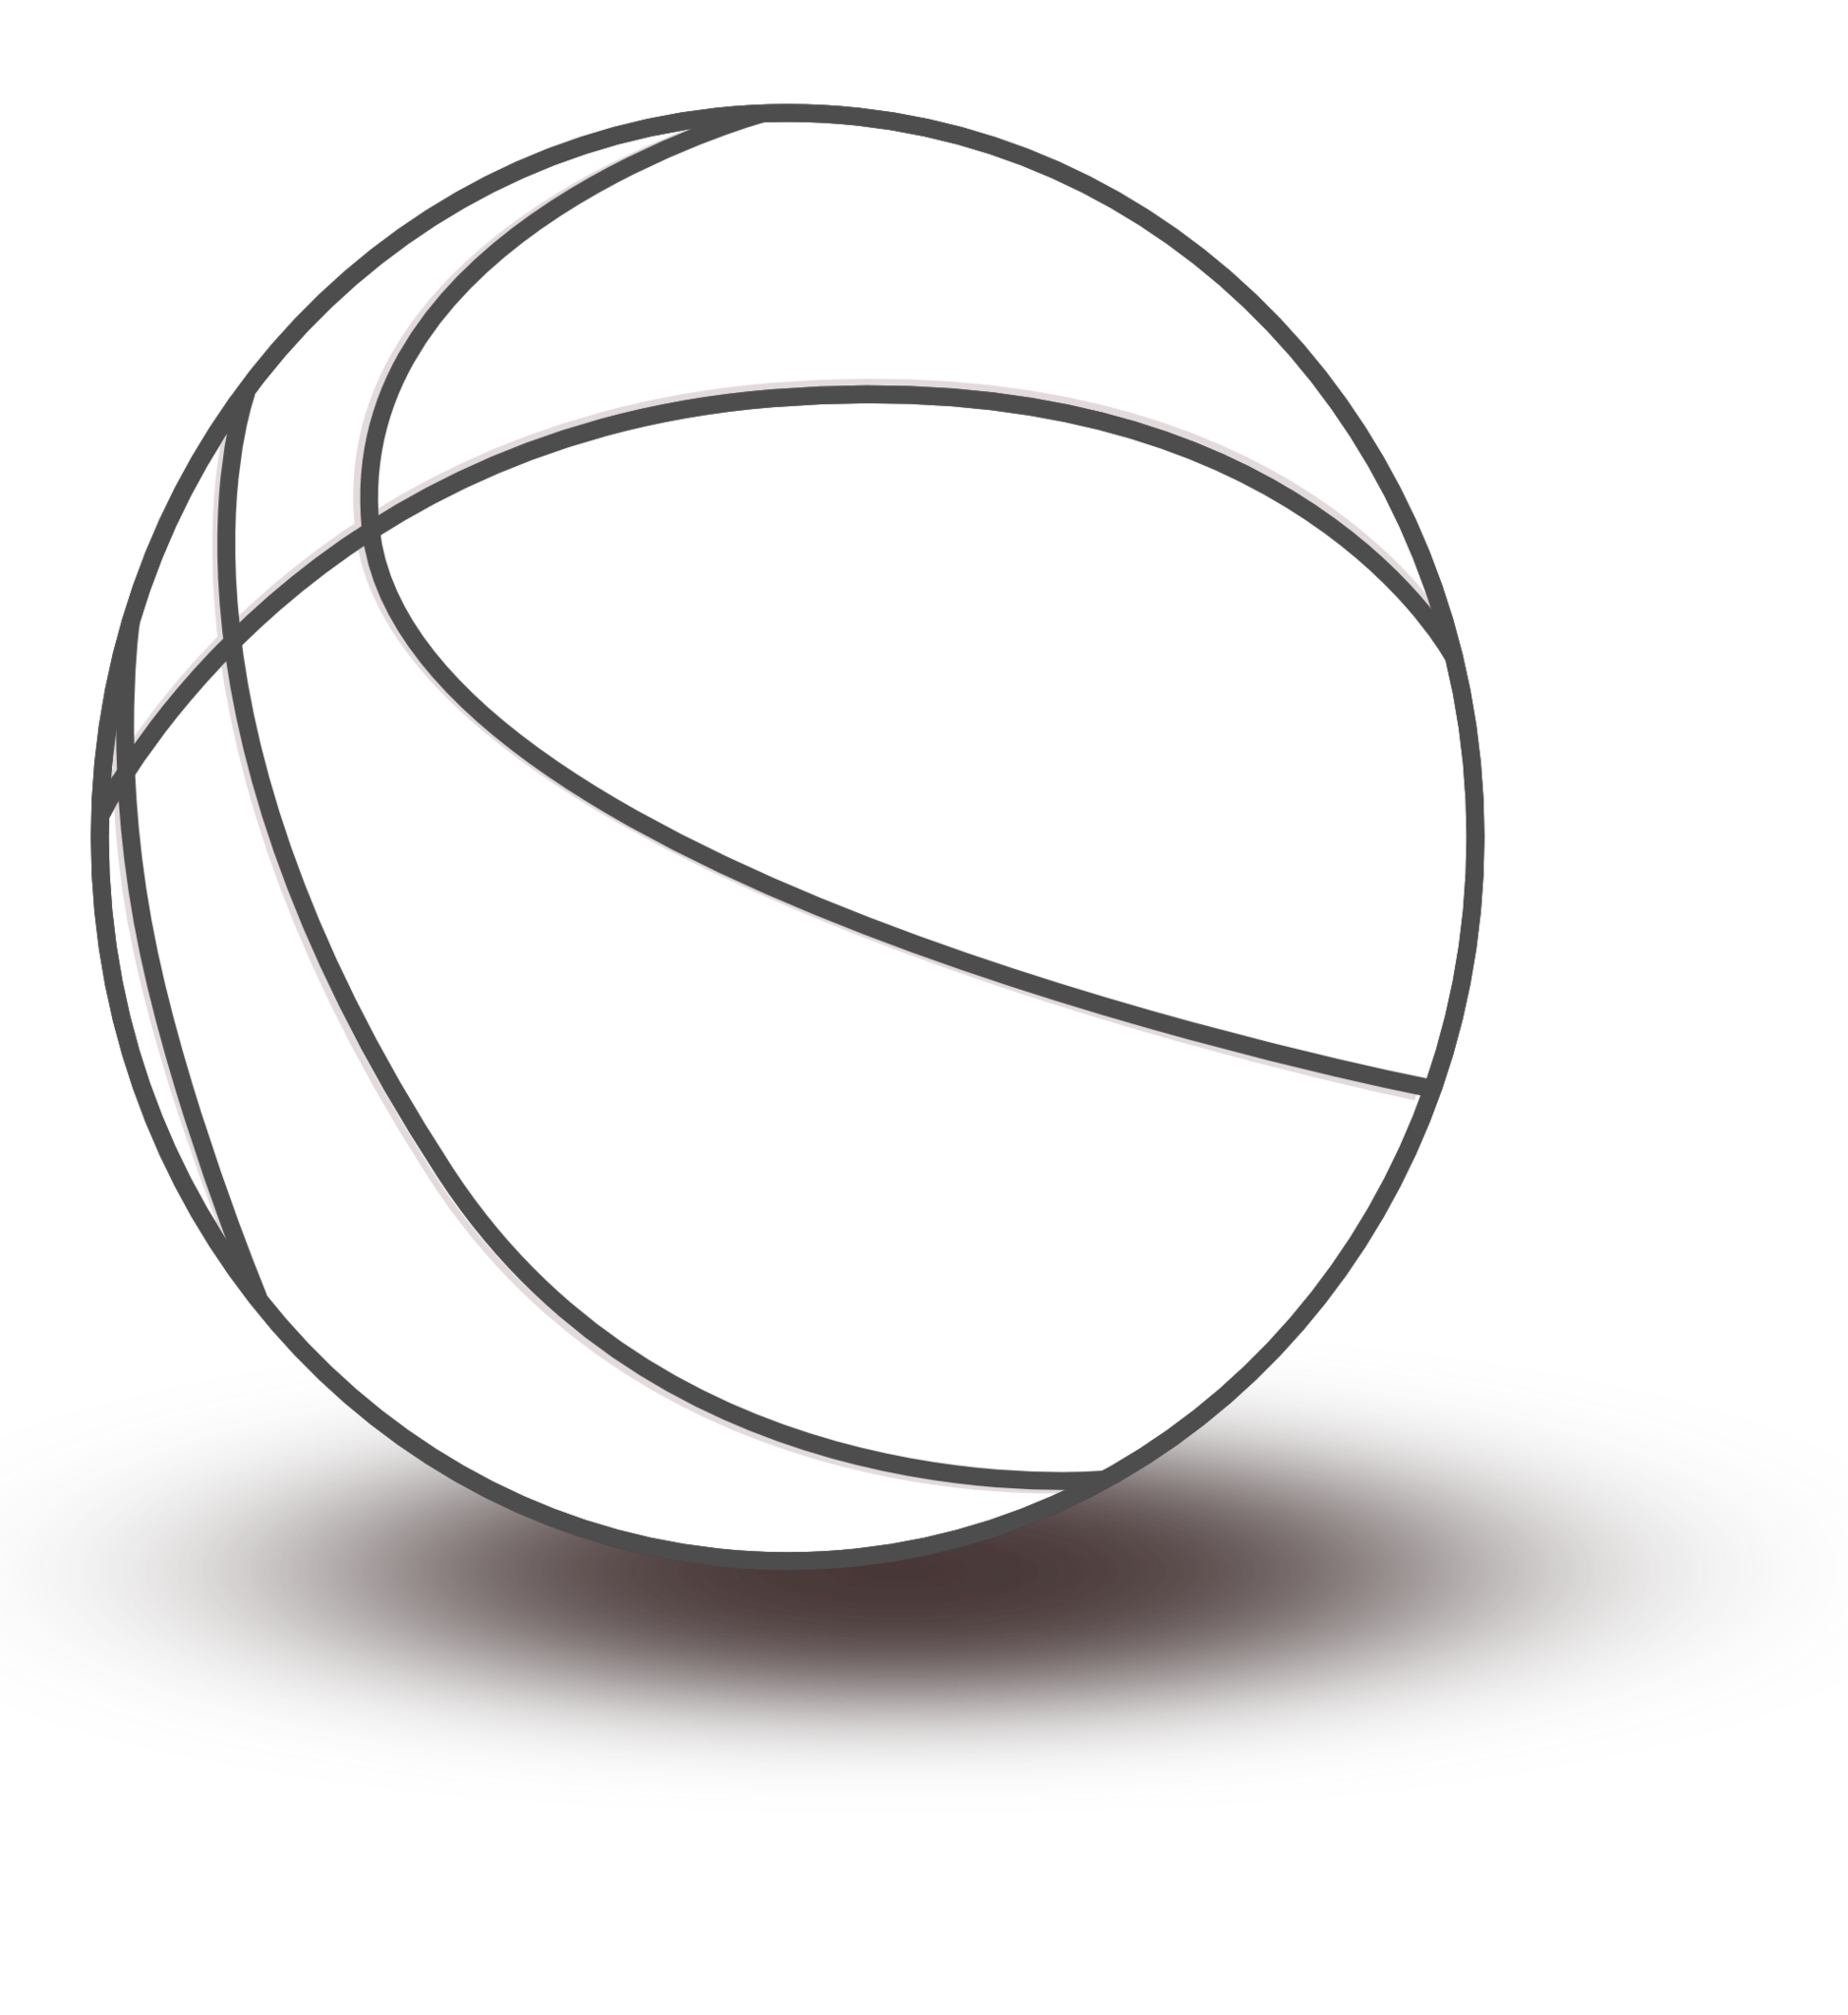 Sphere clipart black and white White basketball Art Free Free